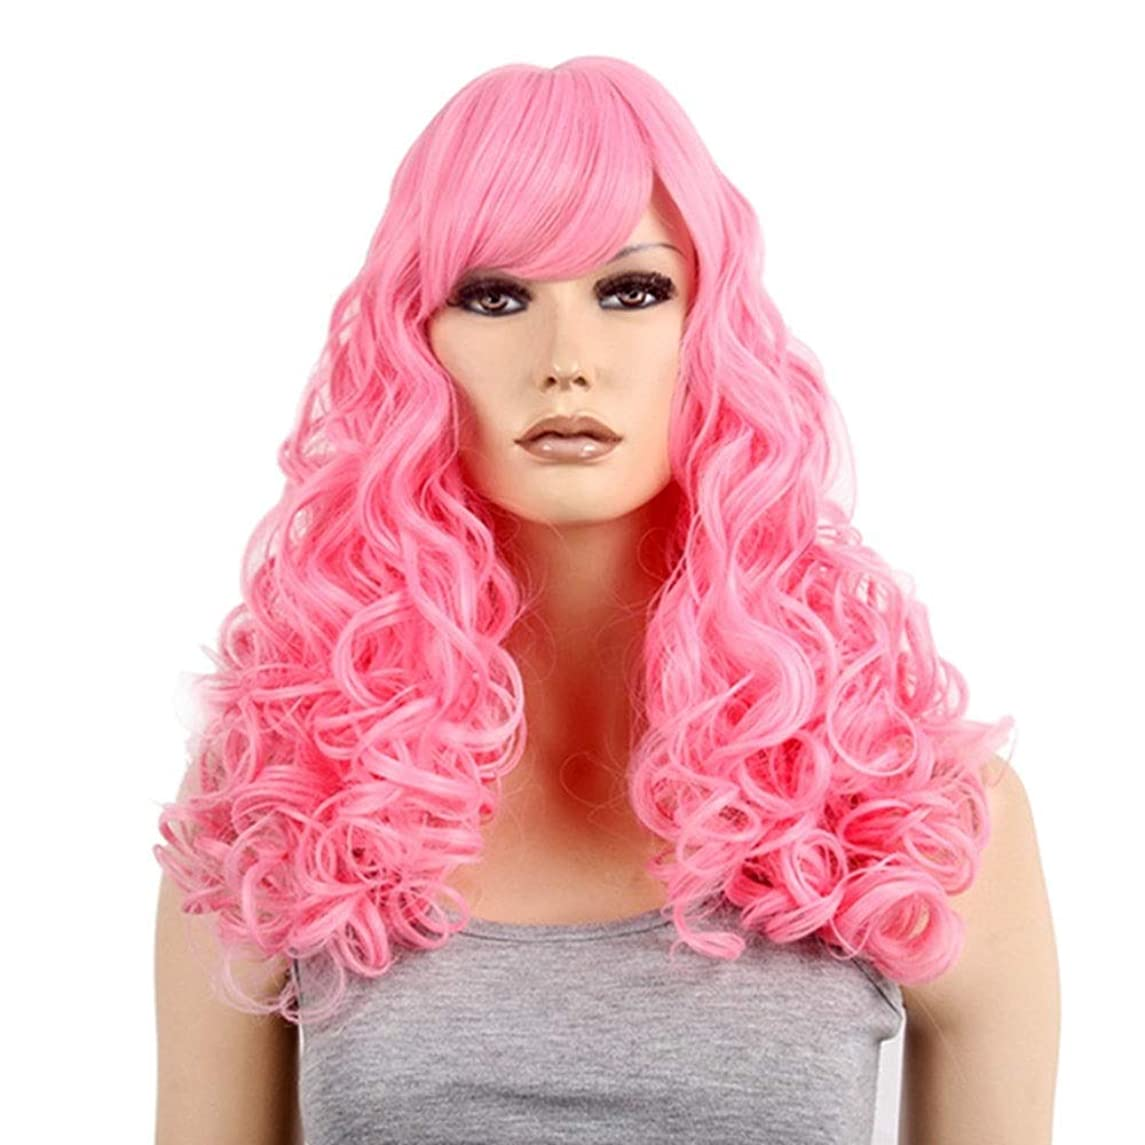 BOBIDYEE コスプレウィッグアニメピンクの女性の長い巻き毛のかつらのかつら合成髪のレースのかつらロールプレイングかつら (色 : ピンク)